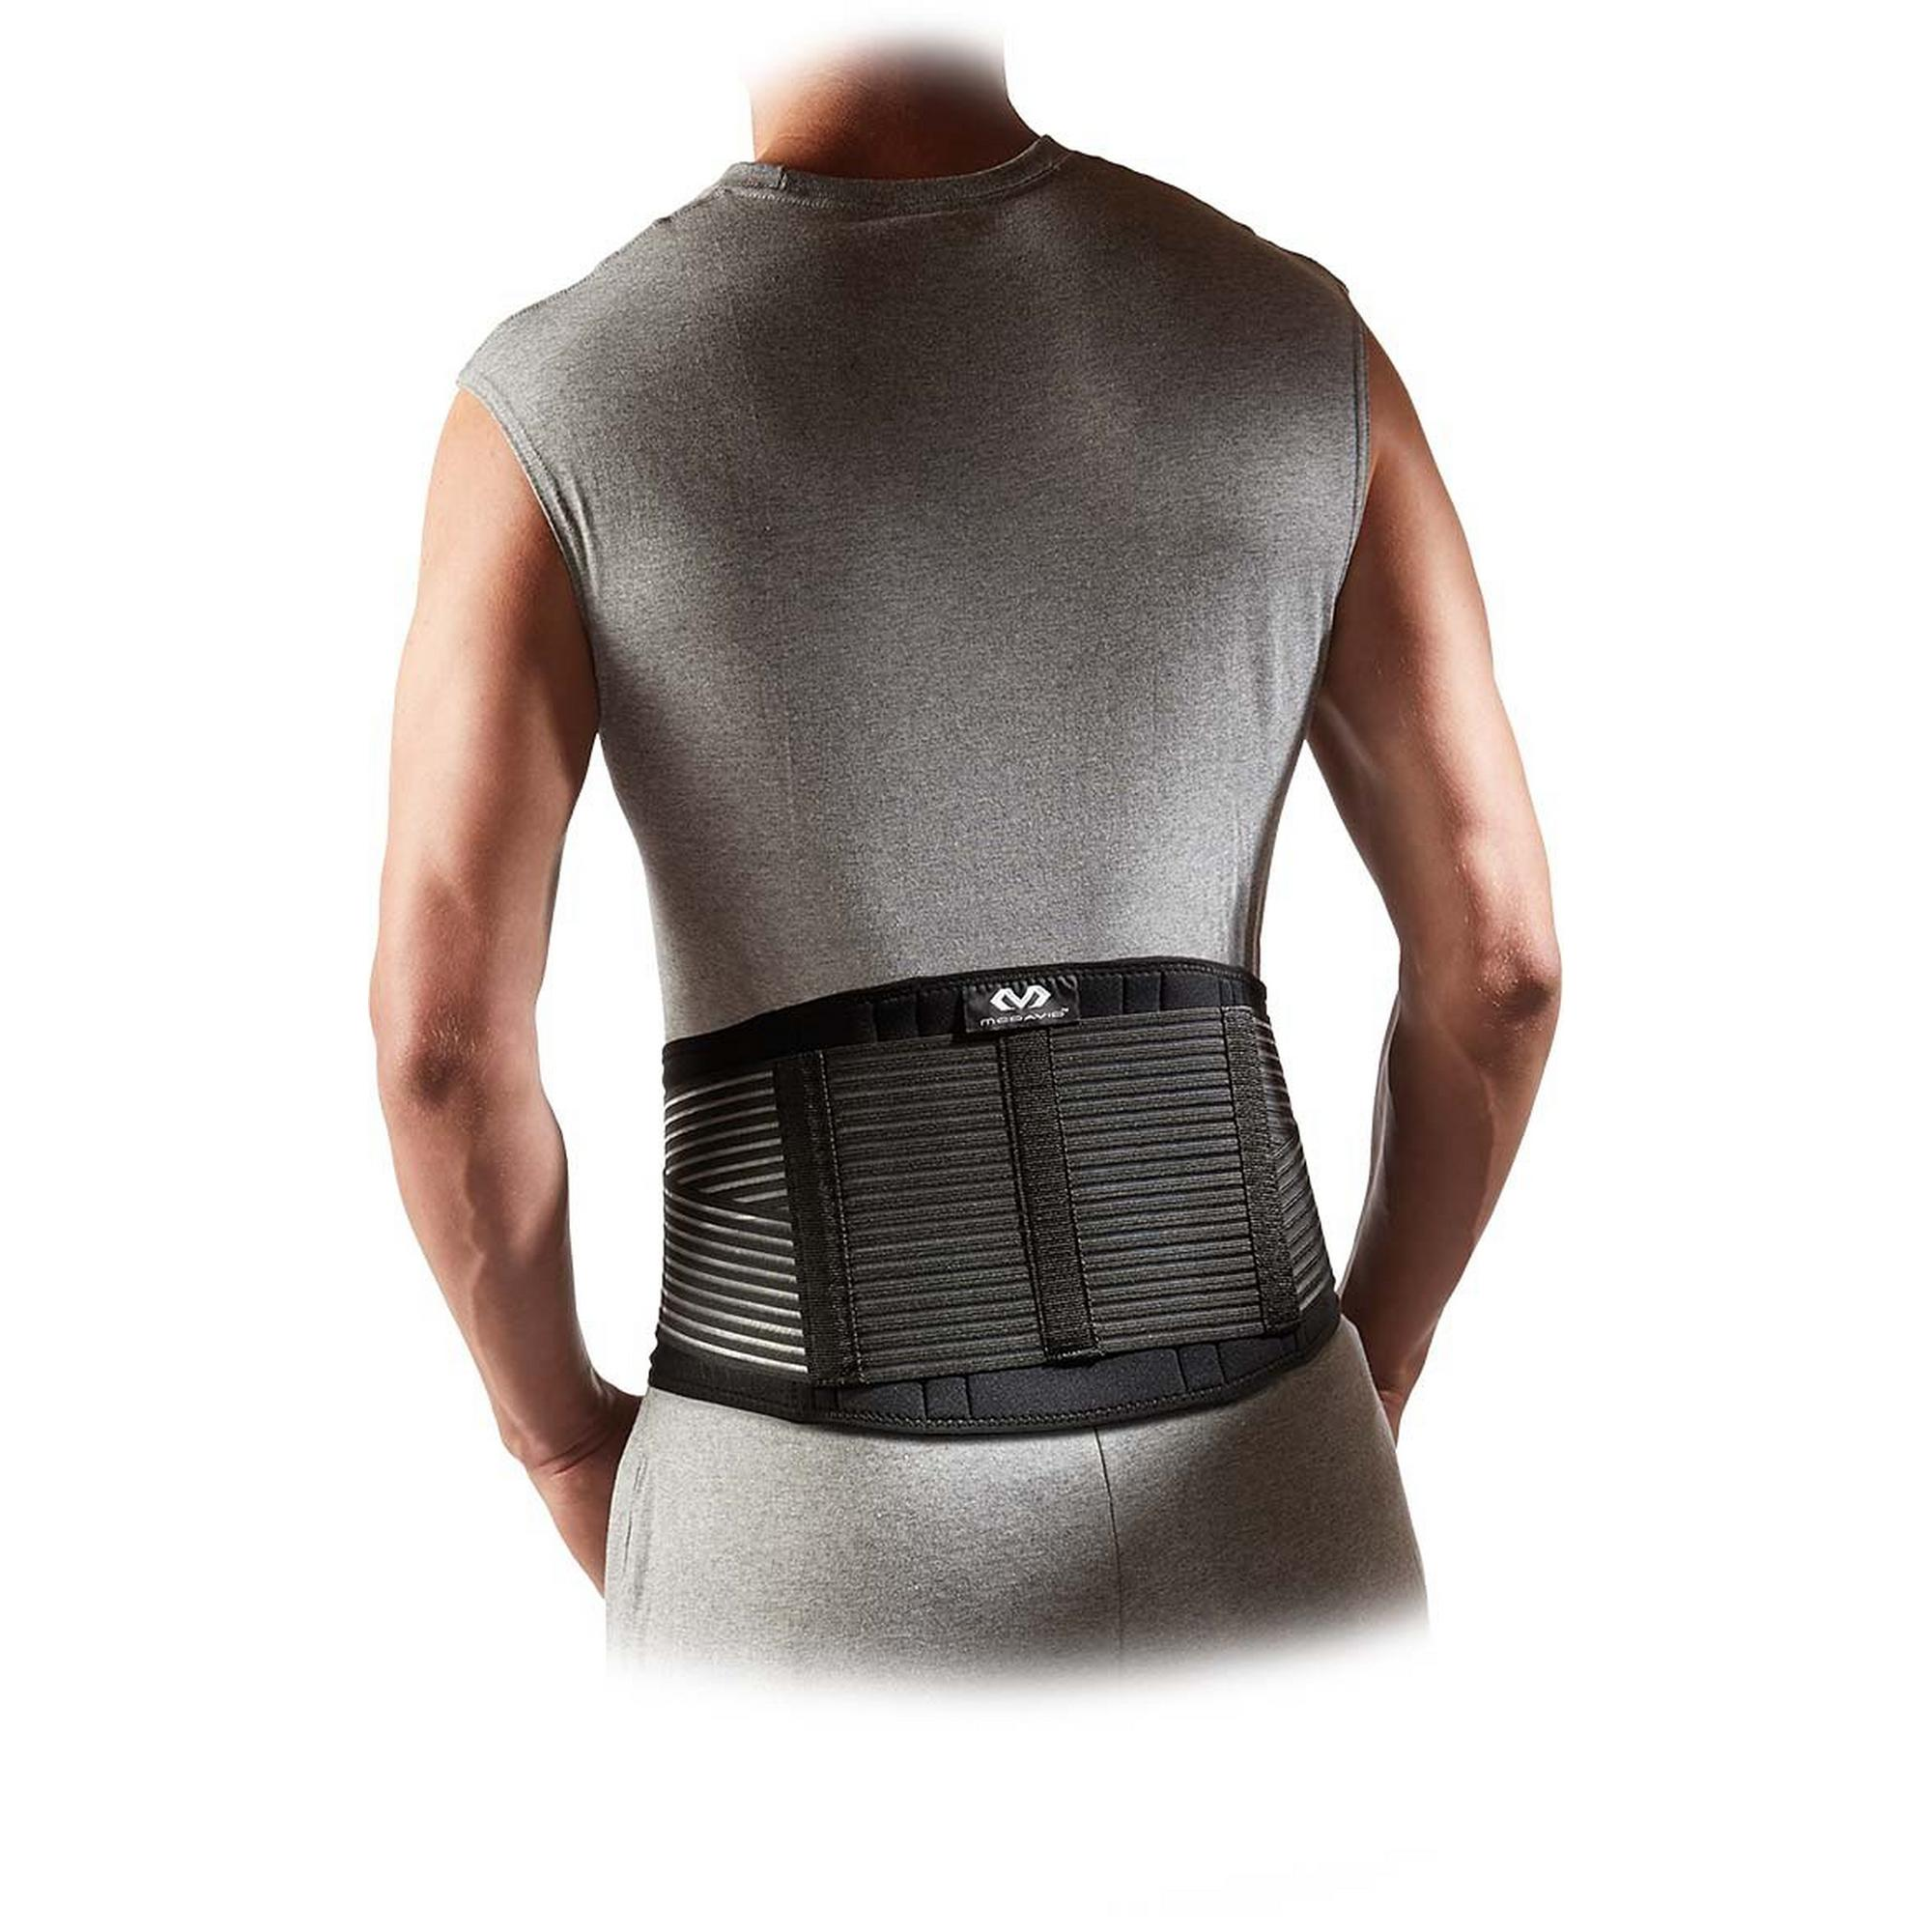 Back Stabilizer